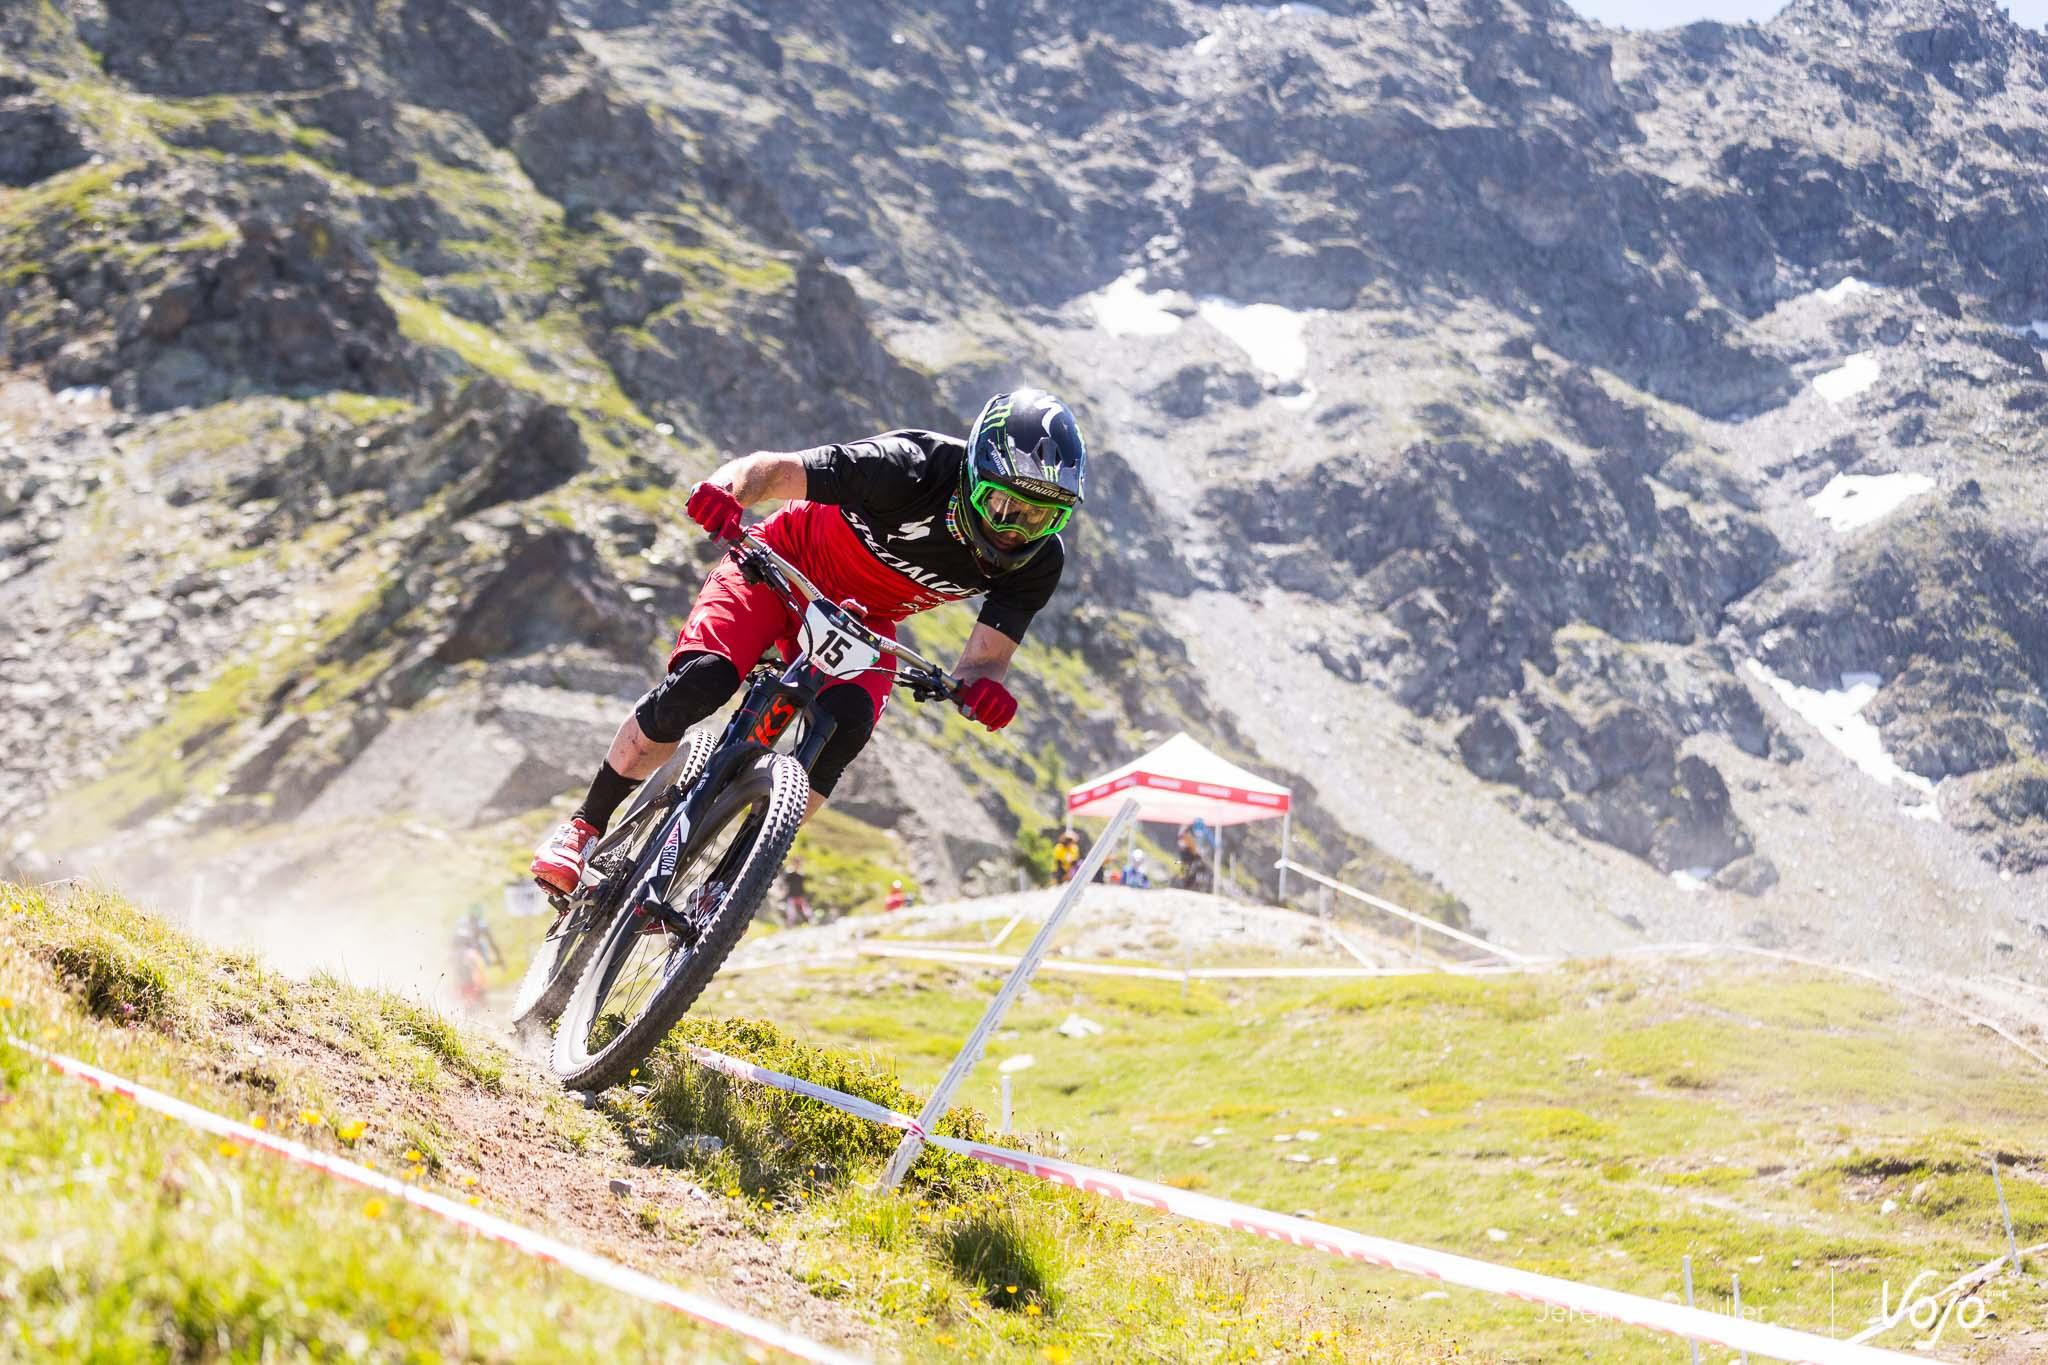 EWS_La_Thuile_raceday_1_Copyright_Reuiller_VojoMag-28